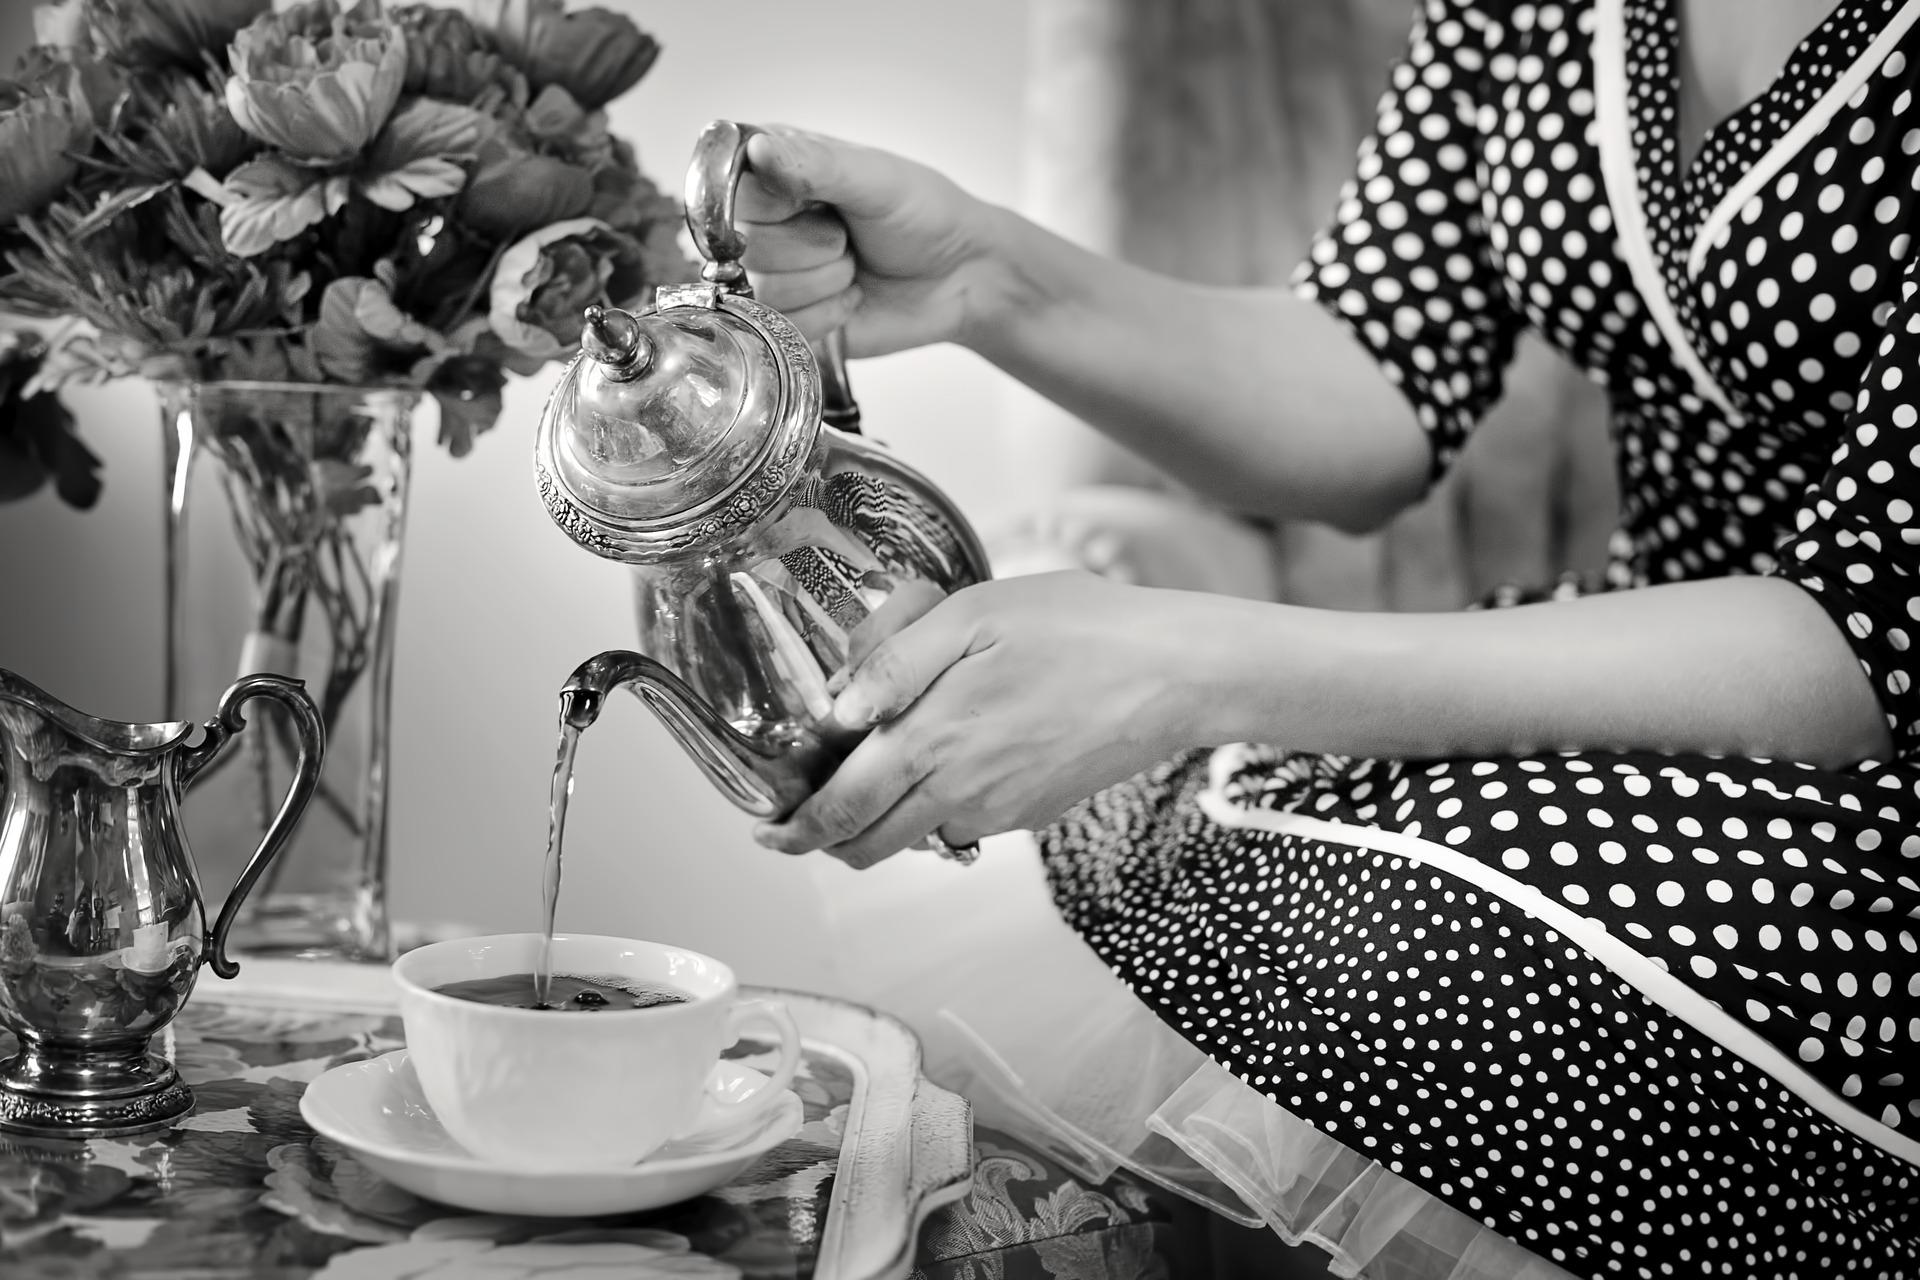 tea-party-1001654_1920.jpg